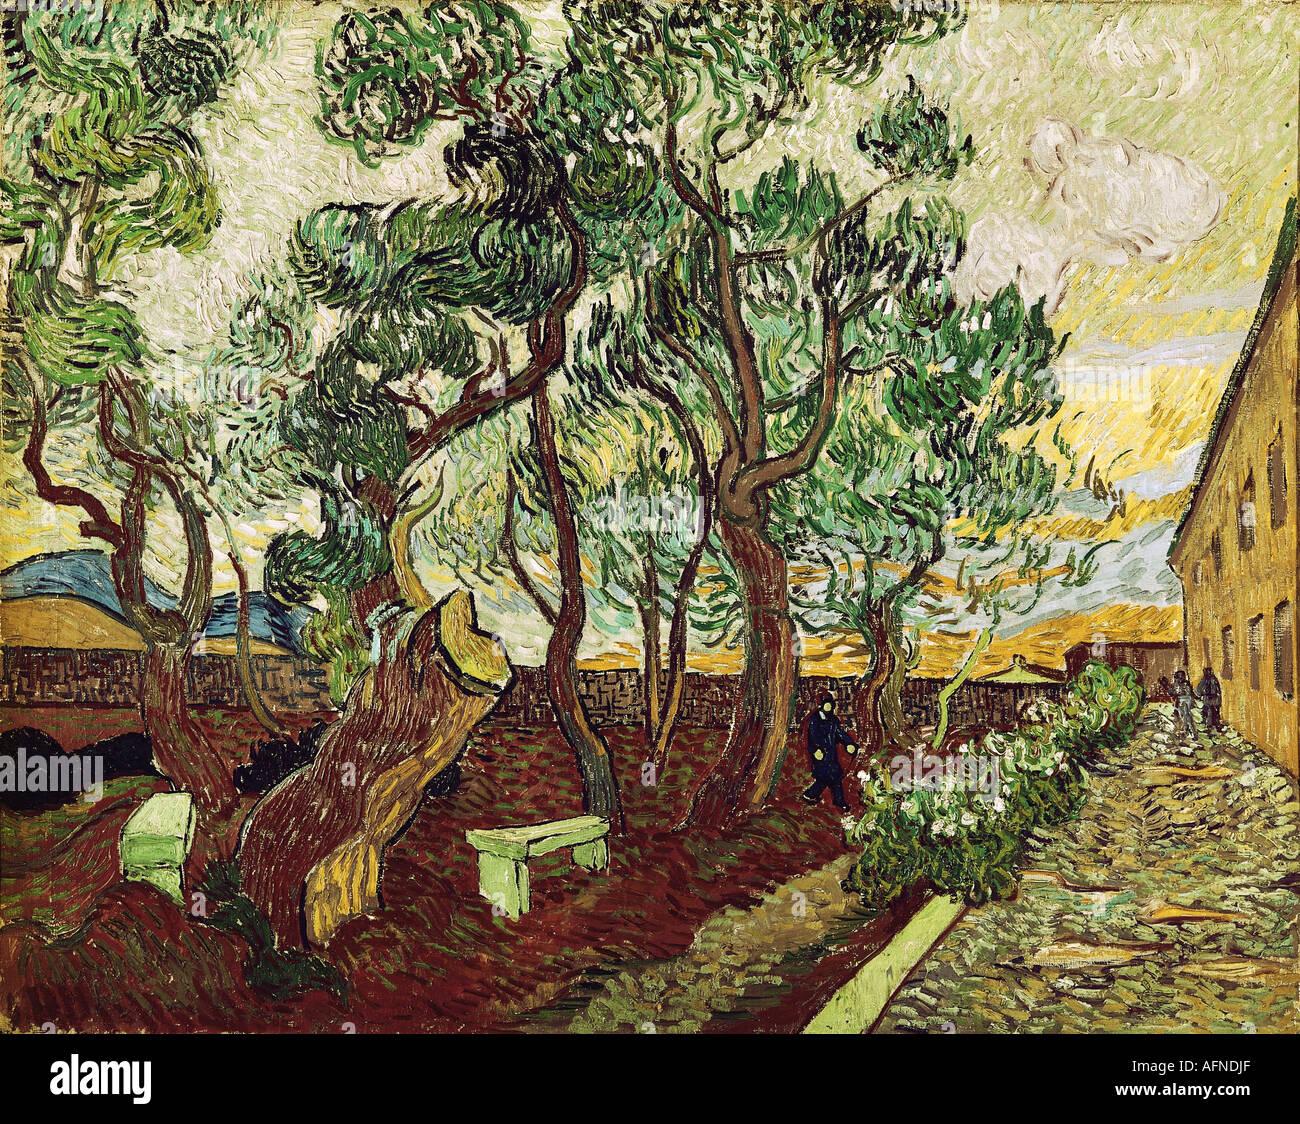 """Bellas Artes, Vincent van Gogh, (1853 - 1890), pintura, ""Le Jardin de la maison des alines de Saint Remy"", (""el Foto de stock"